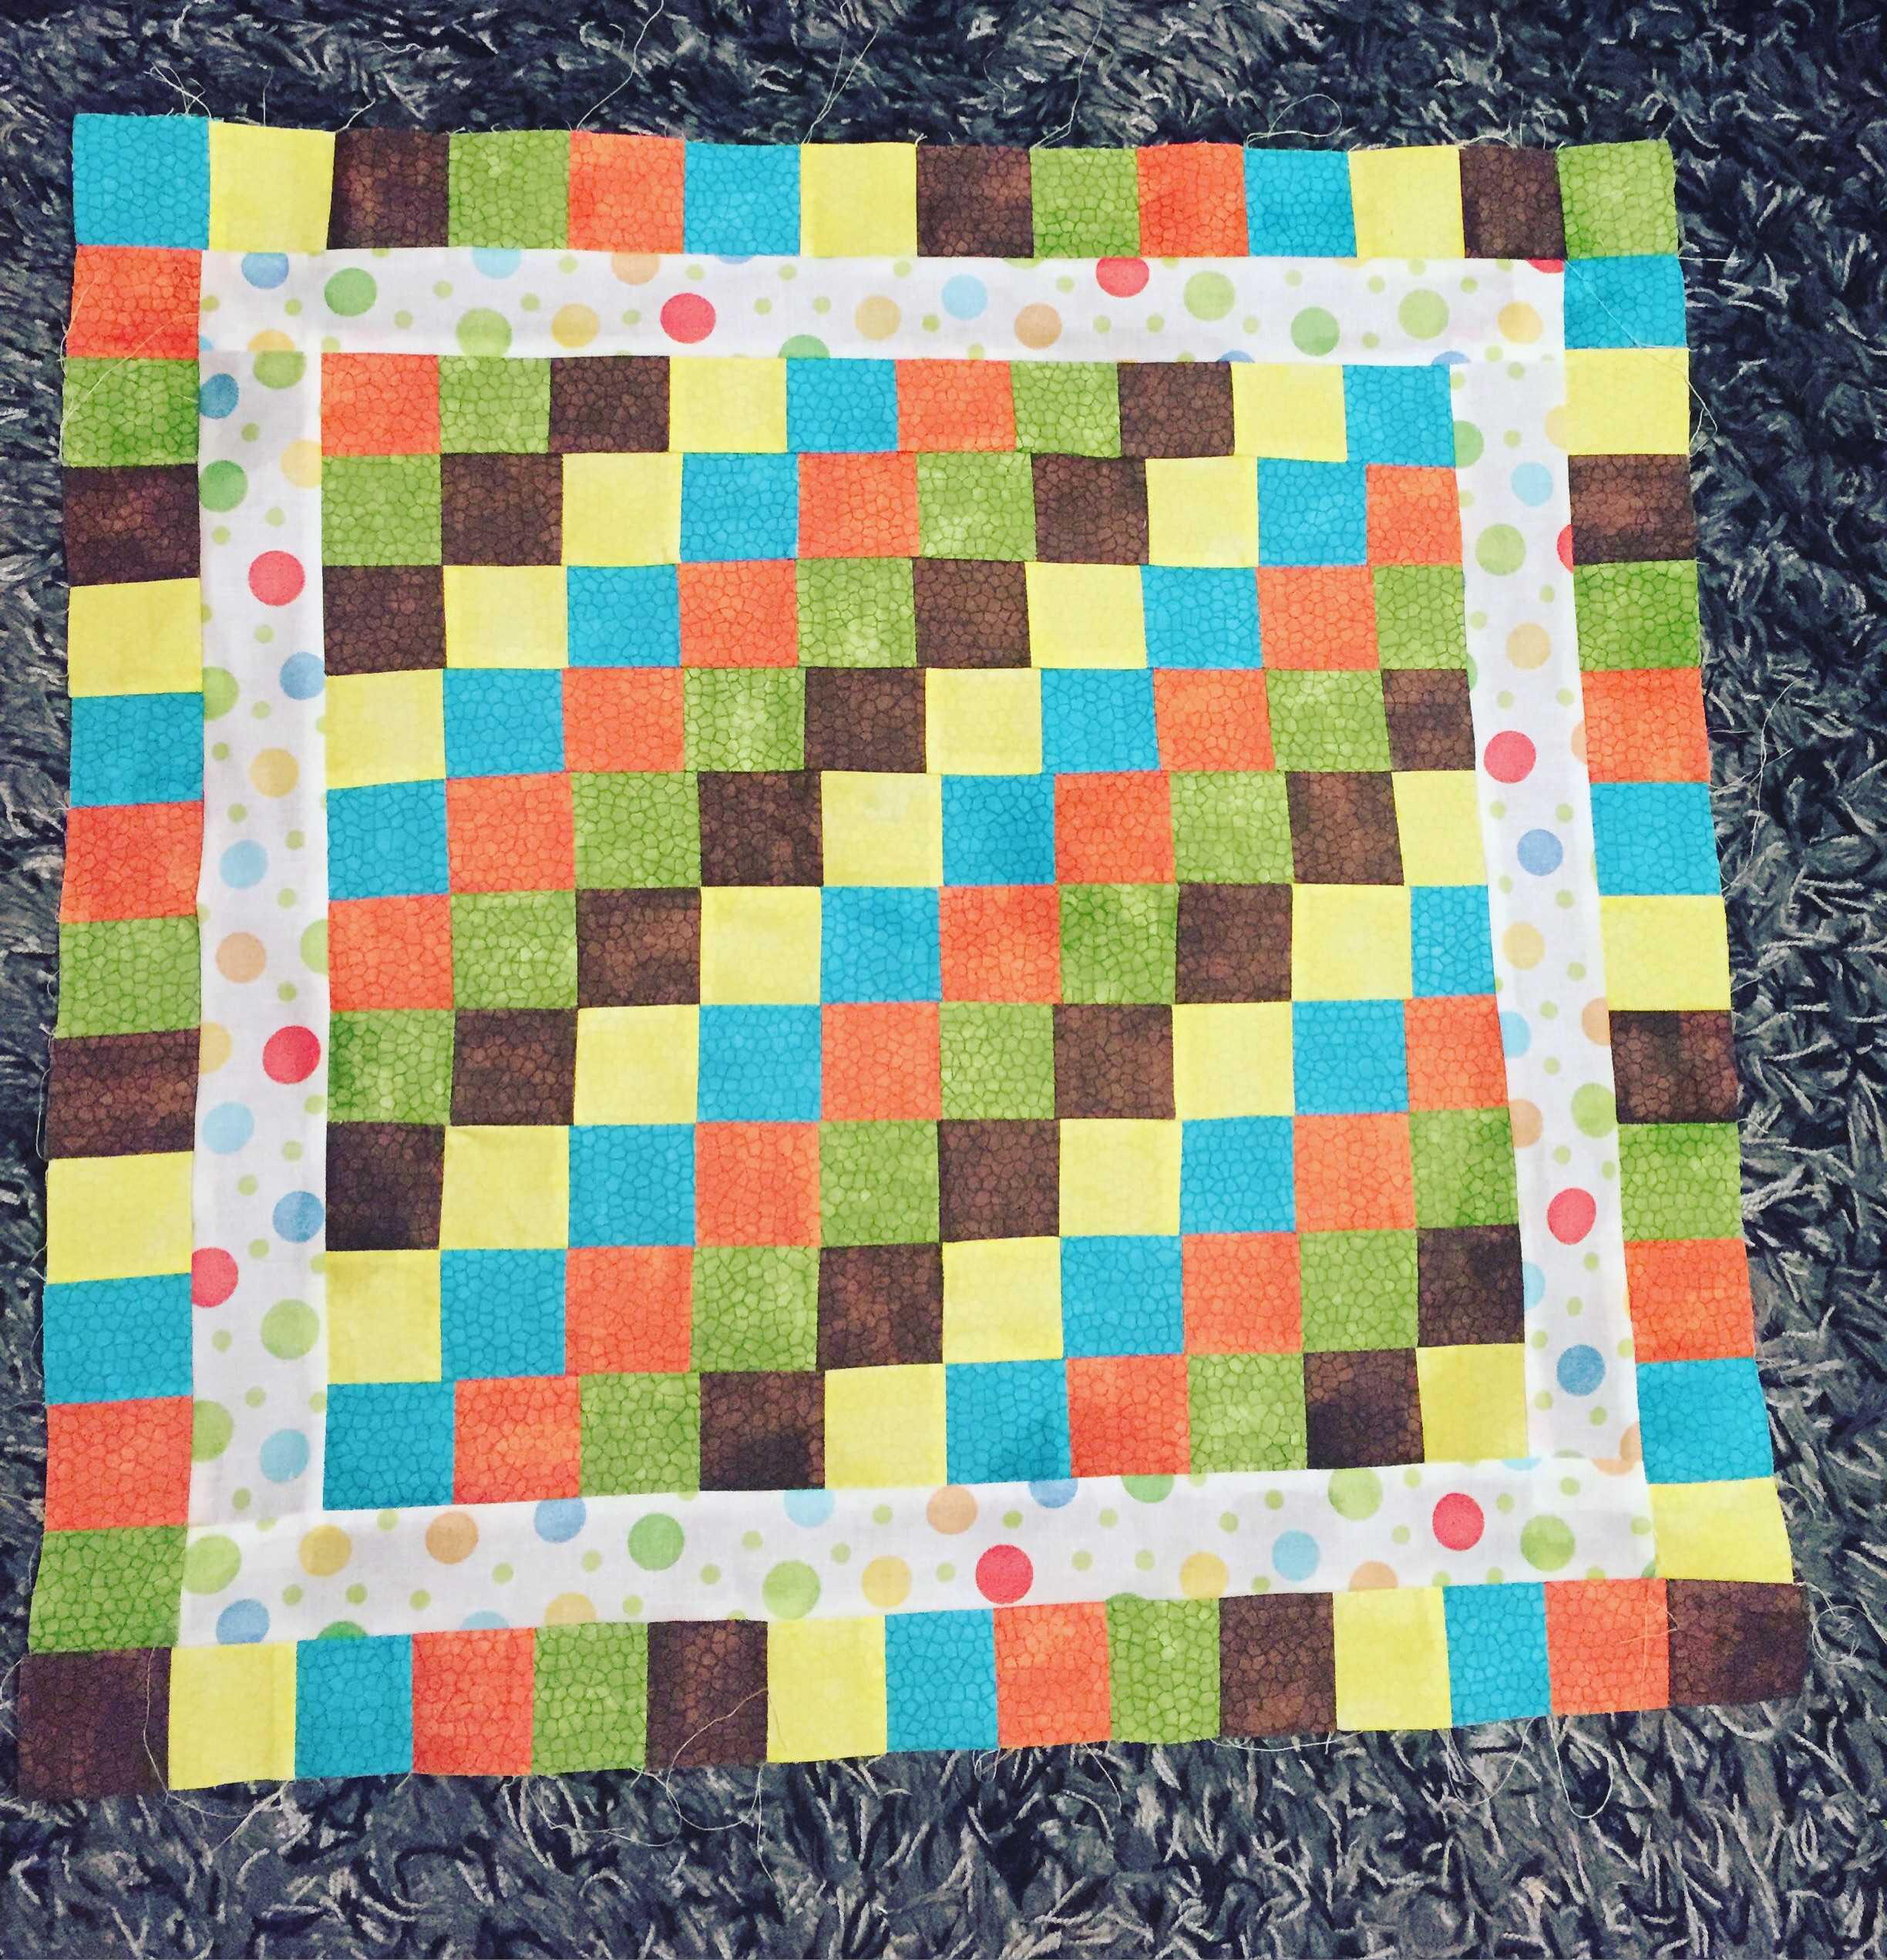 More squares.